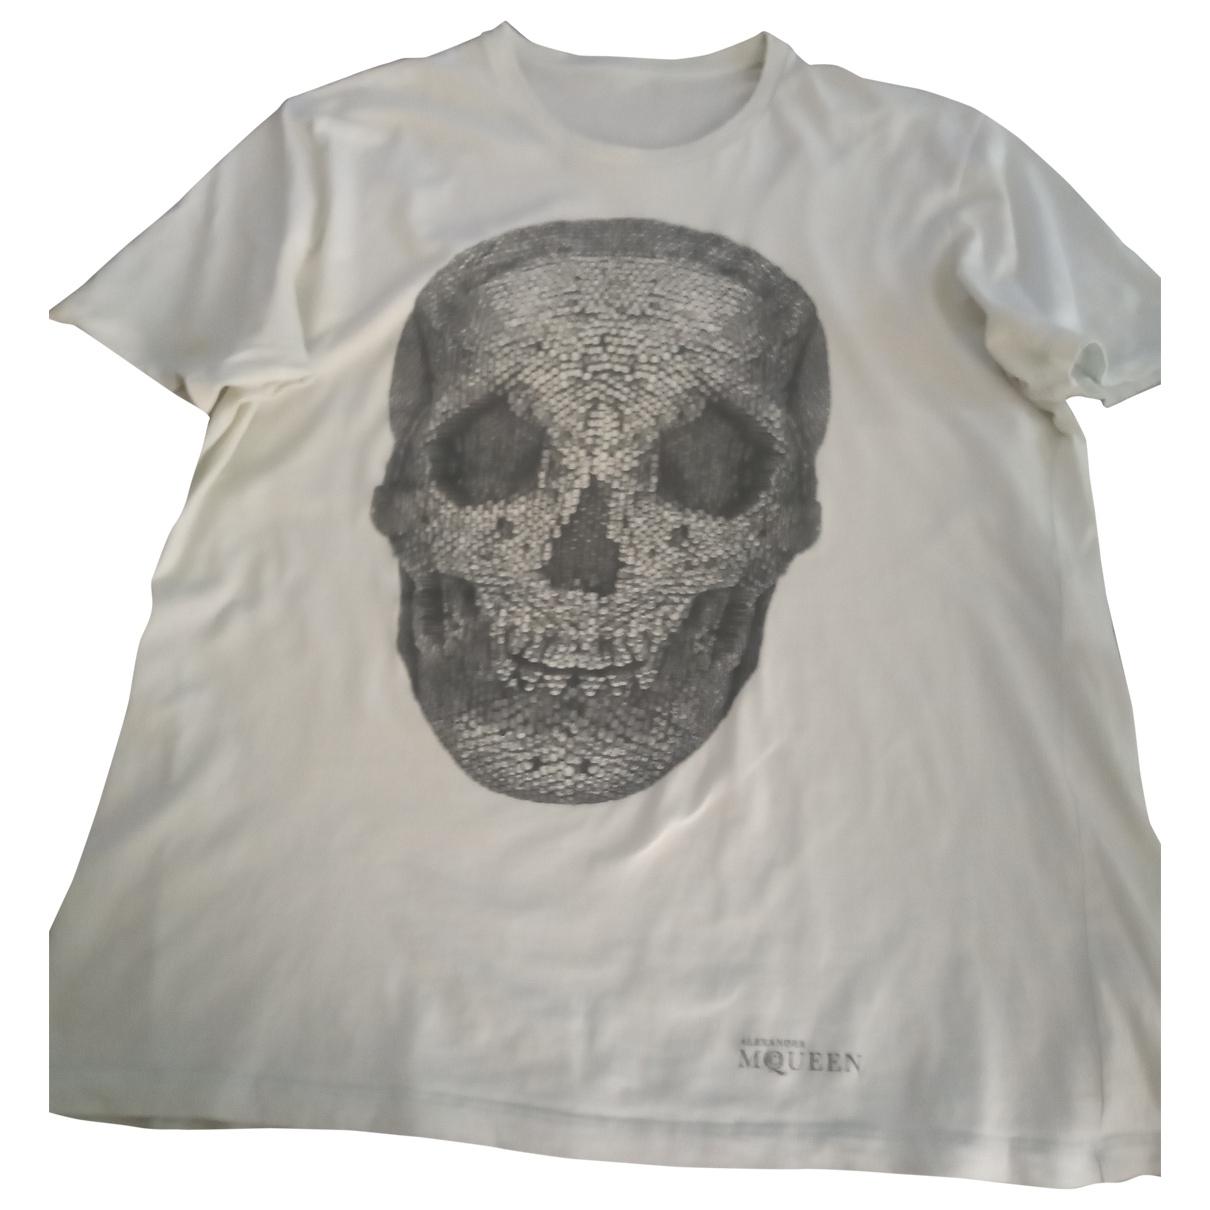 Alexander Mcqueen \N White Cotton T-shirts for Men XL International